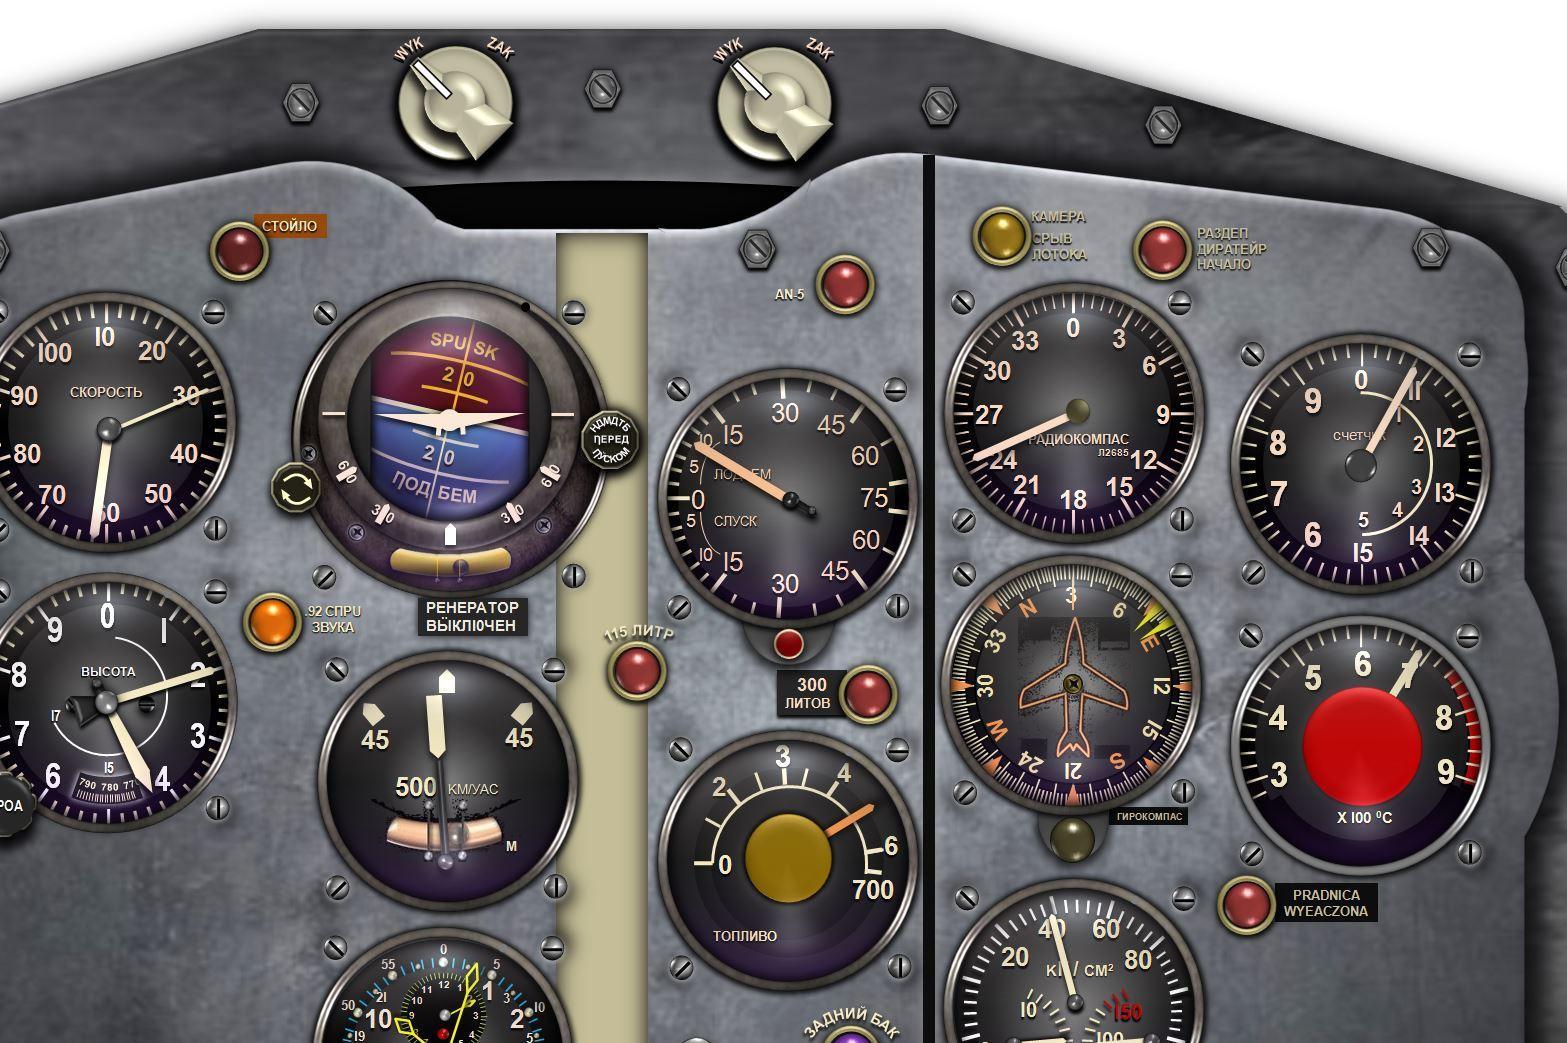 Click image for larger version  Name:MiG15-MiG17-SERIES-COCKPIT-instrument-panel-CDkit-_57-4.jpg Views:39 Size:247.3 KB ID:2250526